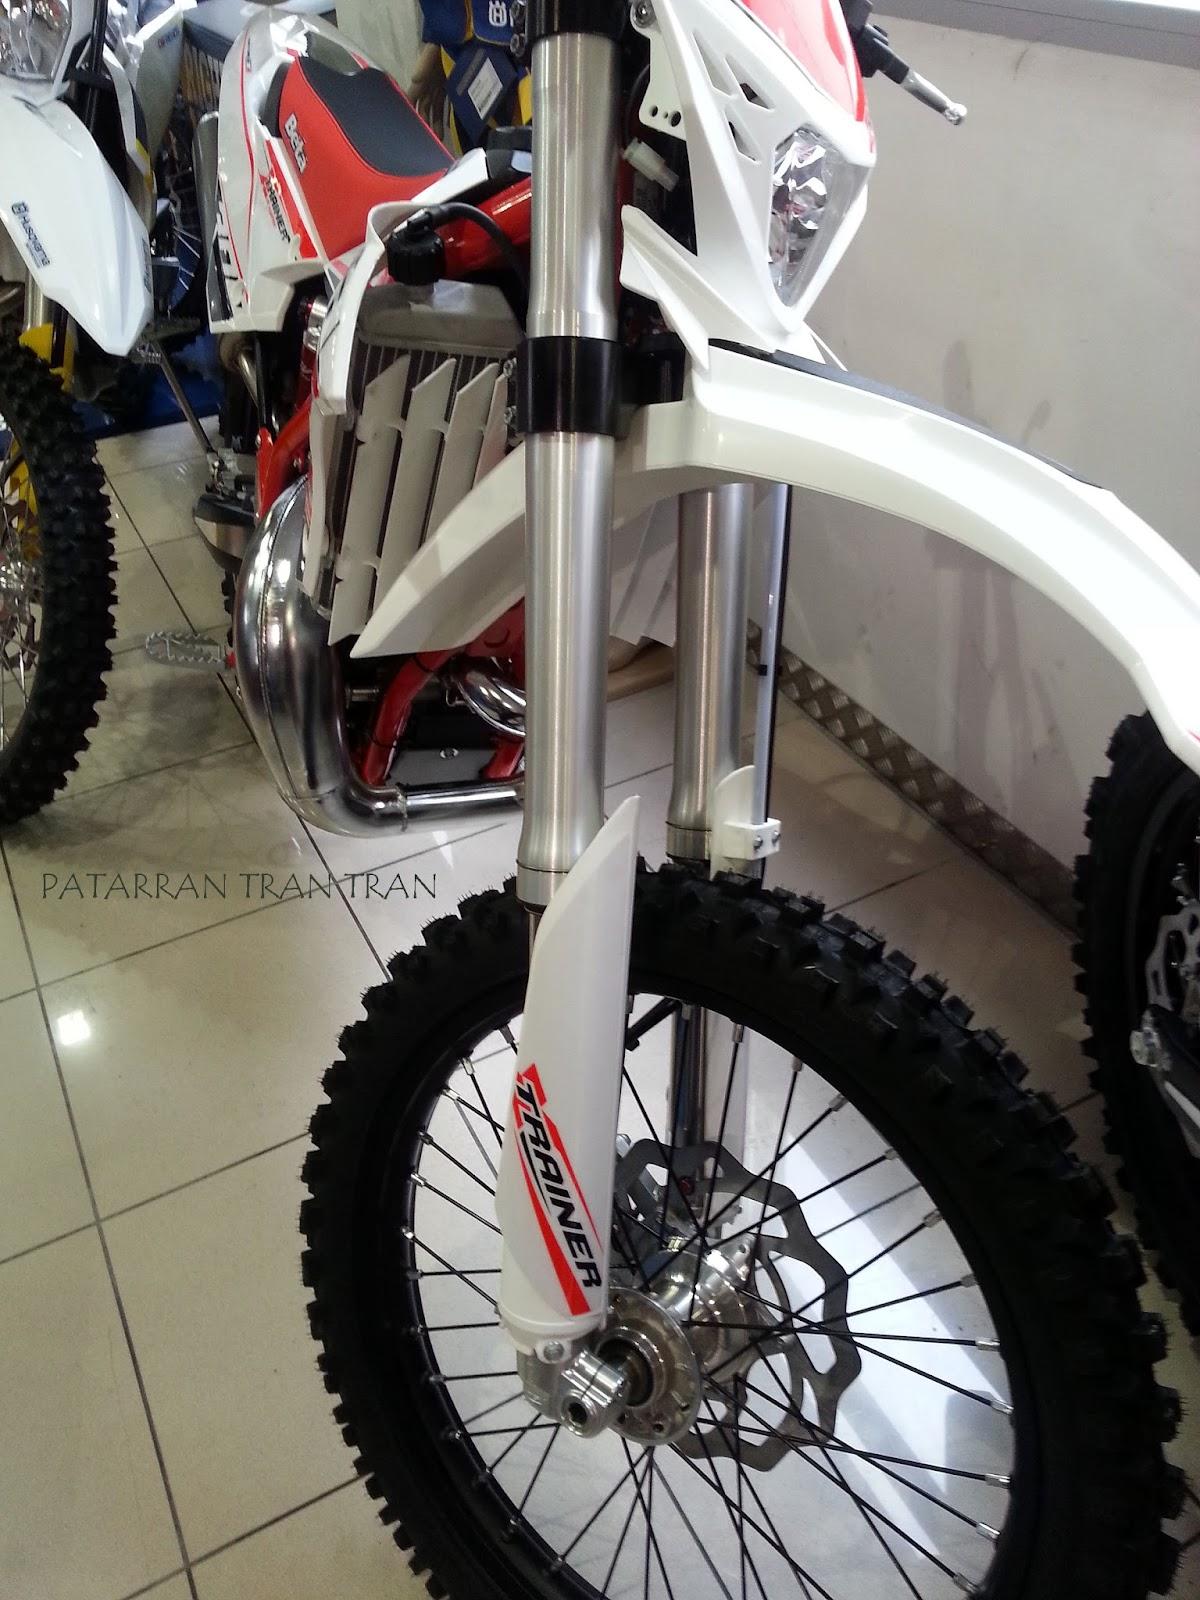 Beta X-Trainer y Beta RR 300. Dos motos de enduro. Dos conceptos.